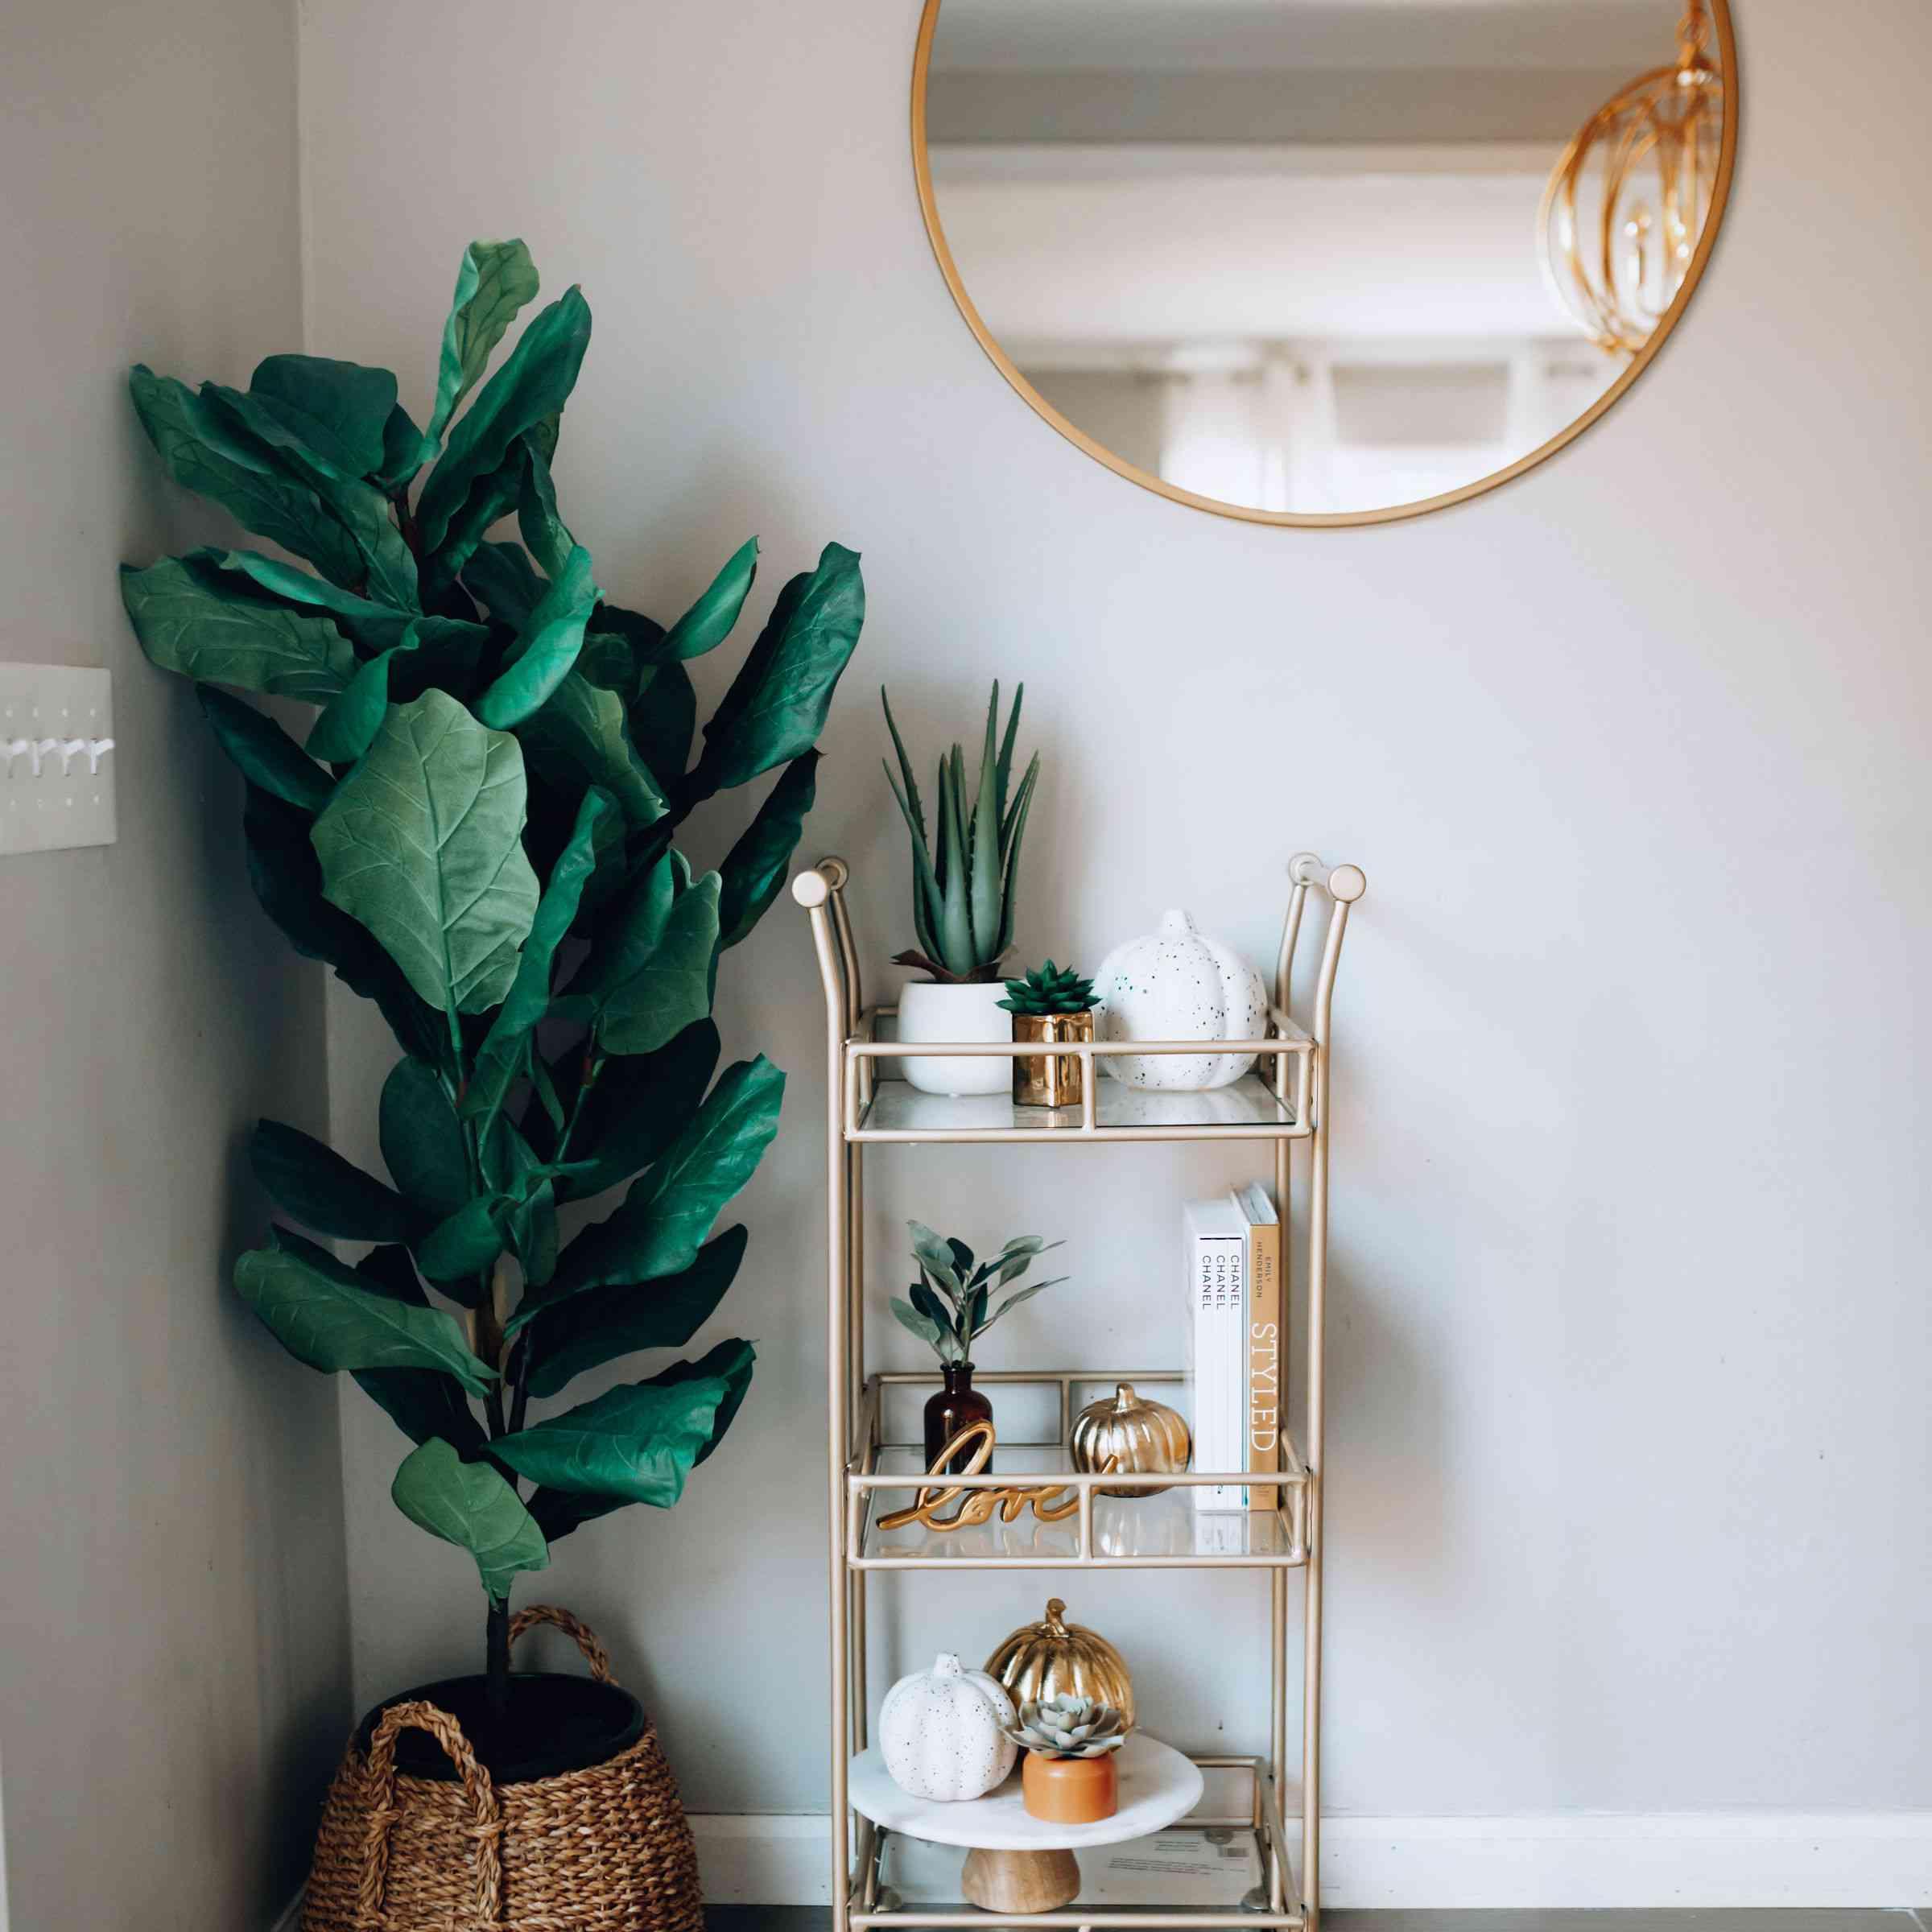 Shannon plant shelf